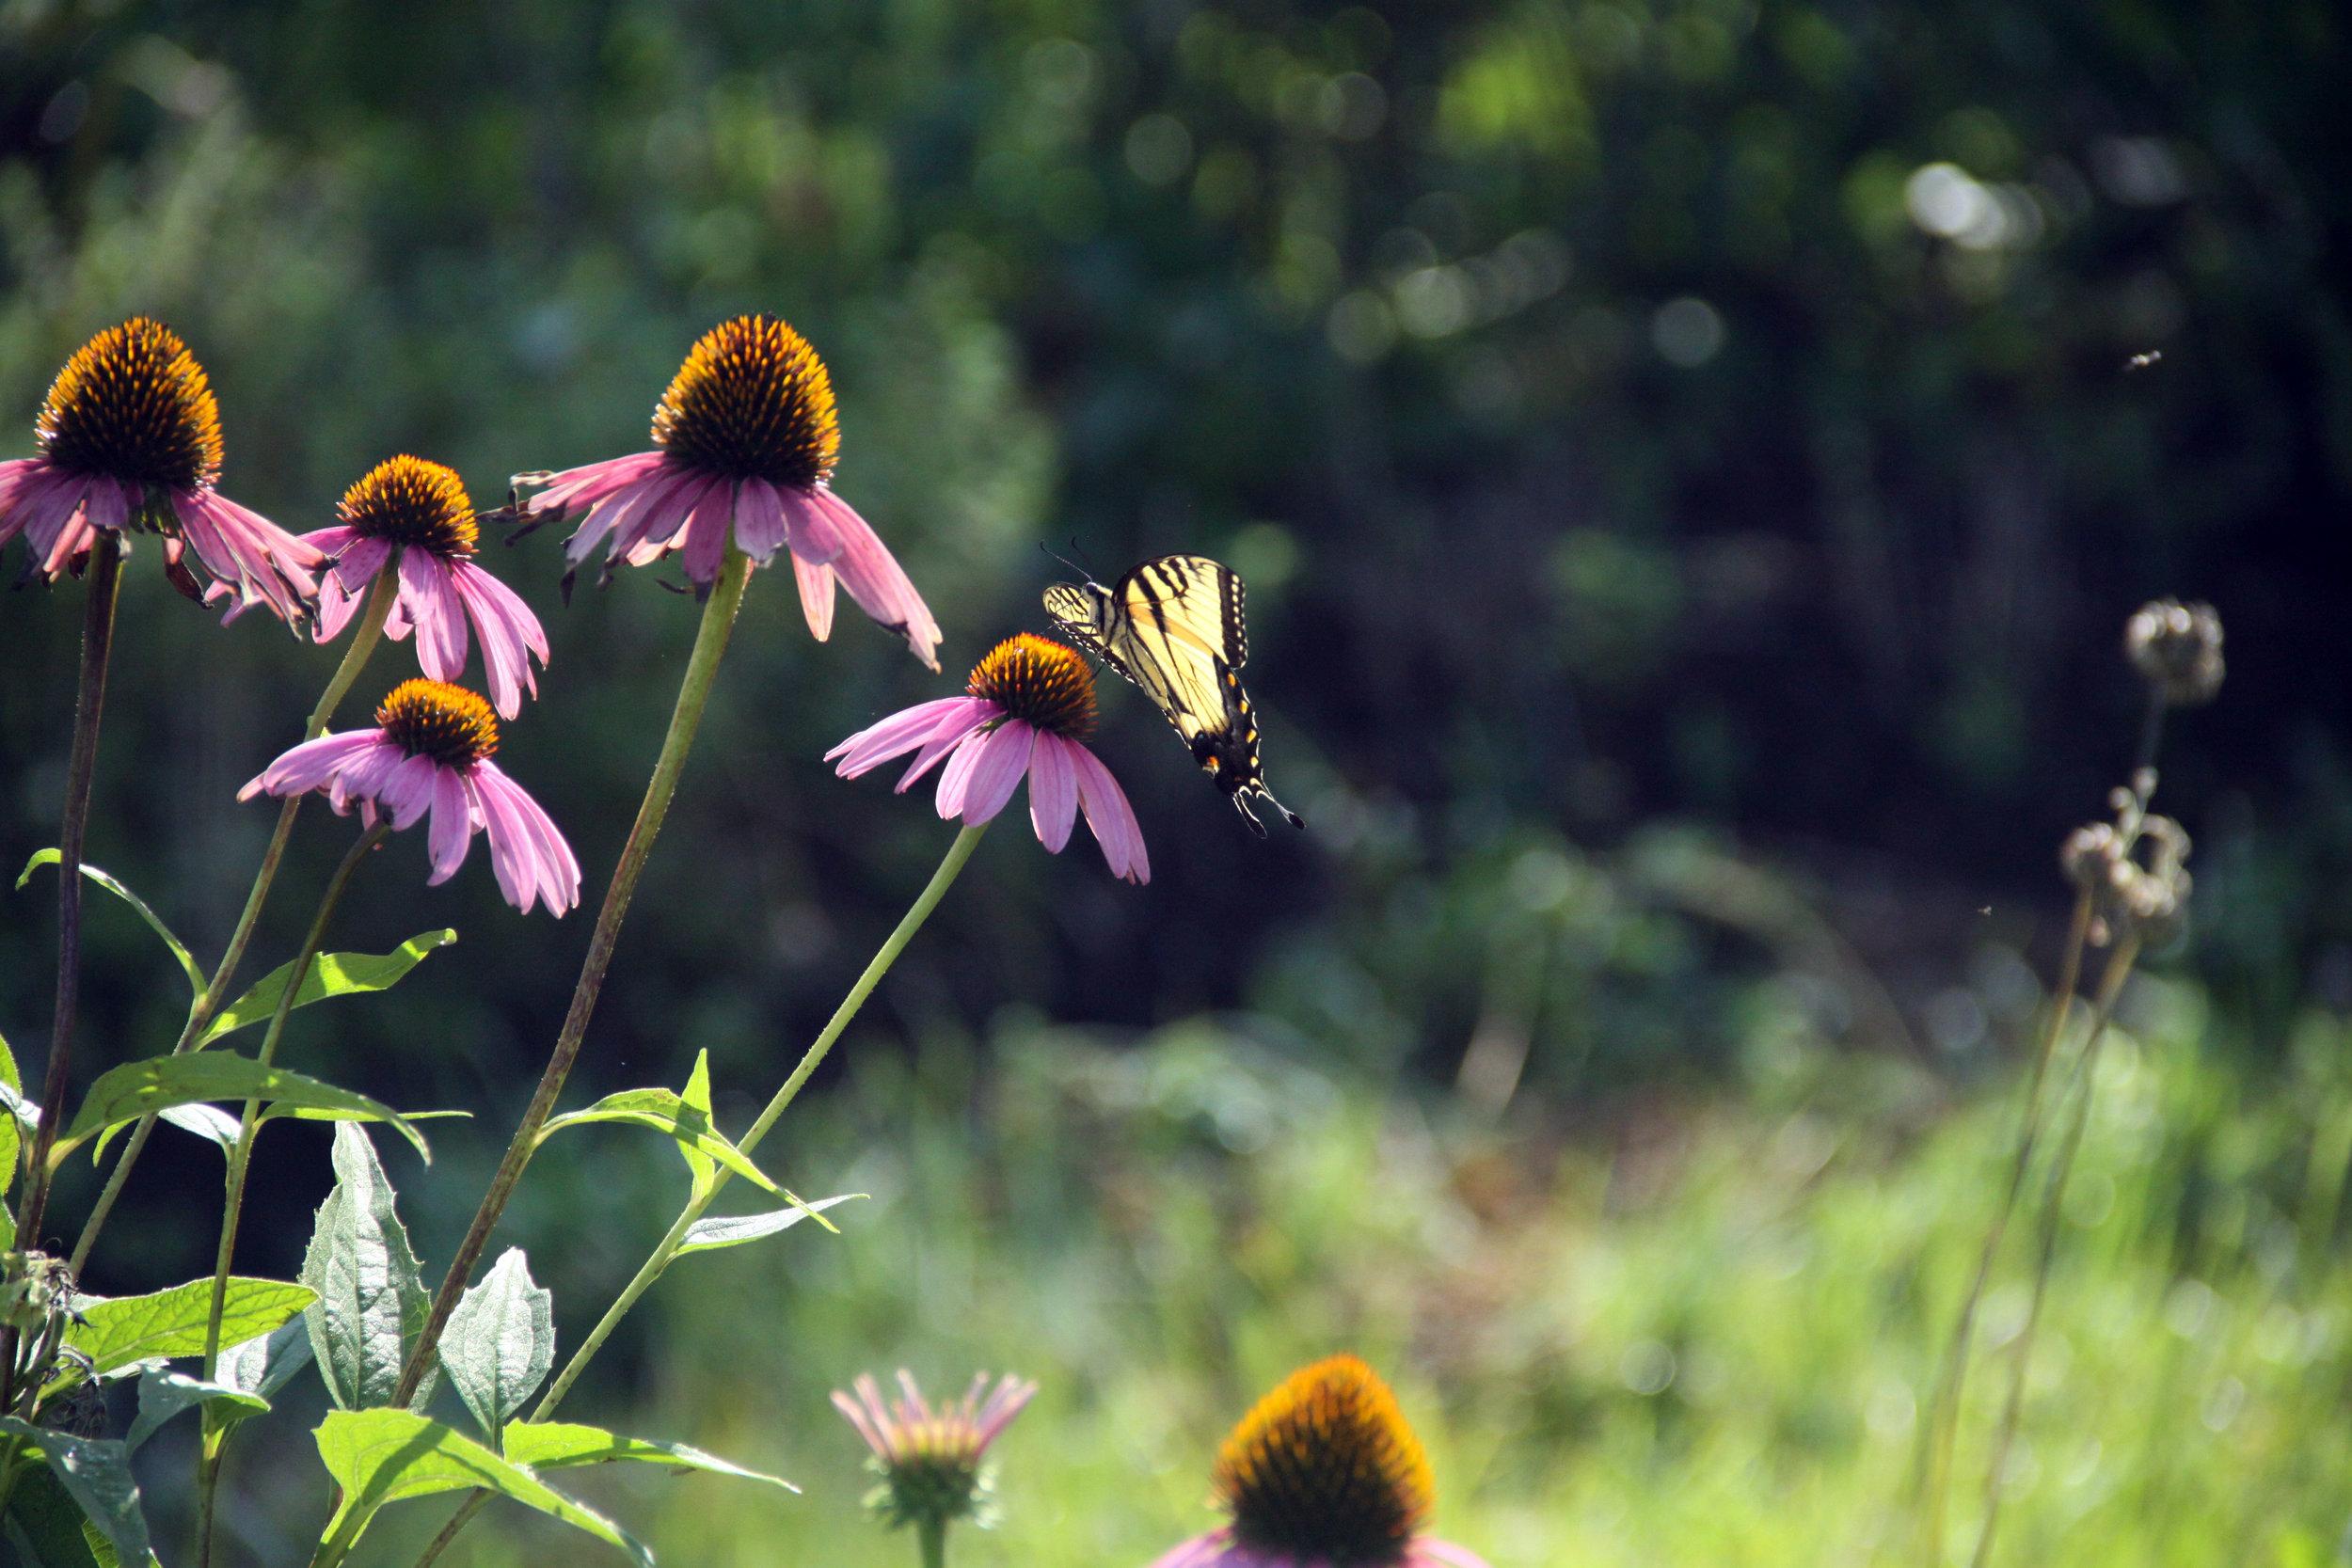 IMG_4012-echinacea-butterfly.jpg